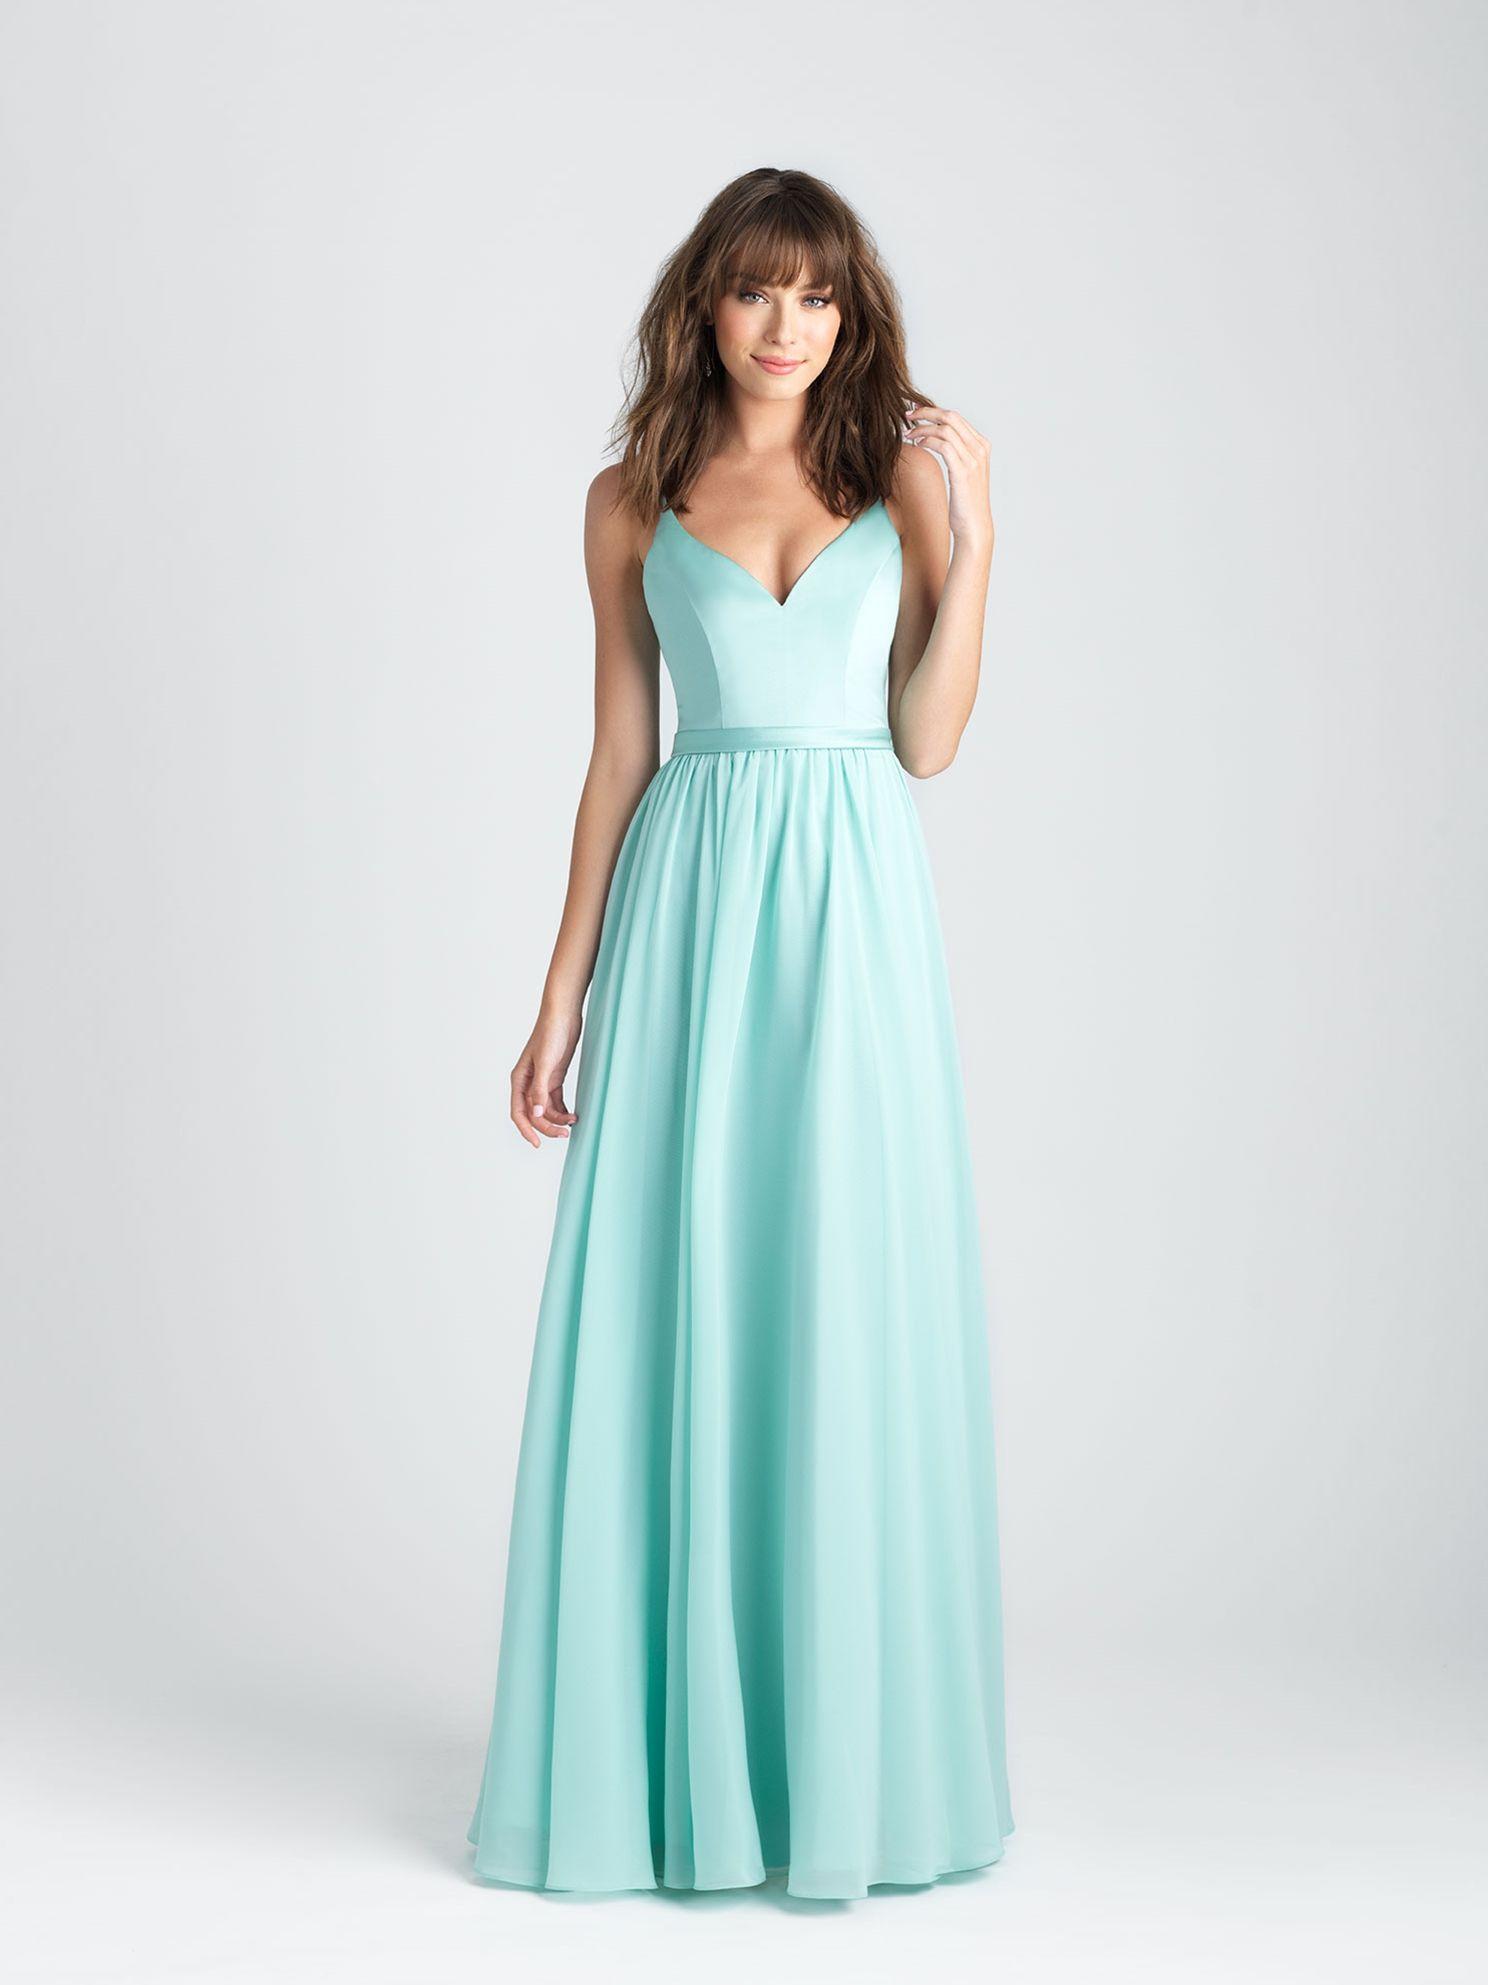 Allure Bridesmaids Bridesmaid Dress Style No 1503